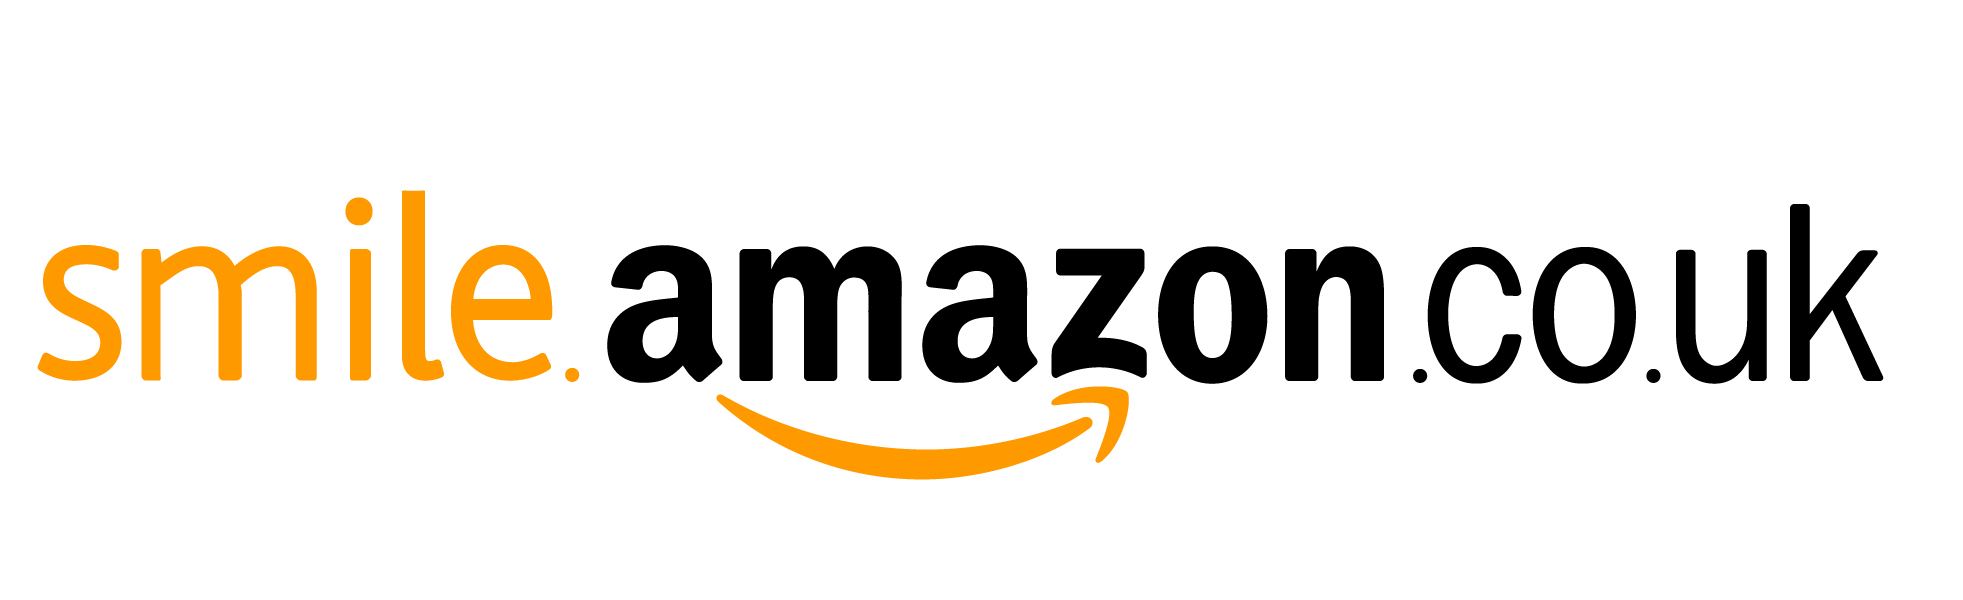 UK_AmazonSmile_Logos_RGB_black+orange_SMALL-ONLY.png